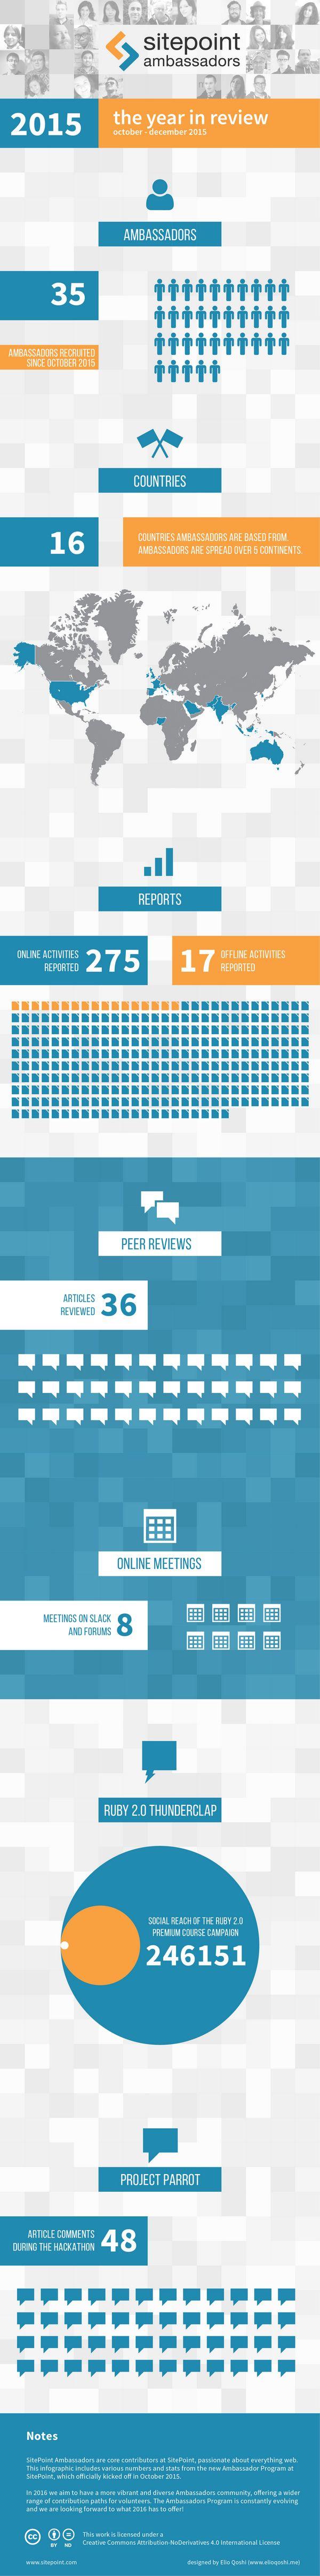 Ambassador 2015 Infographic